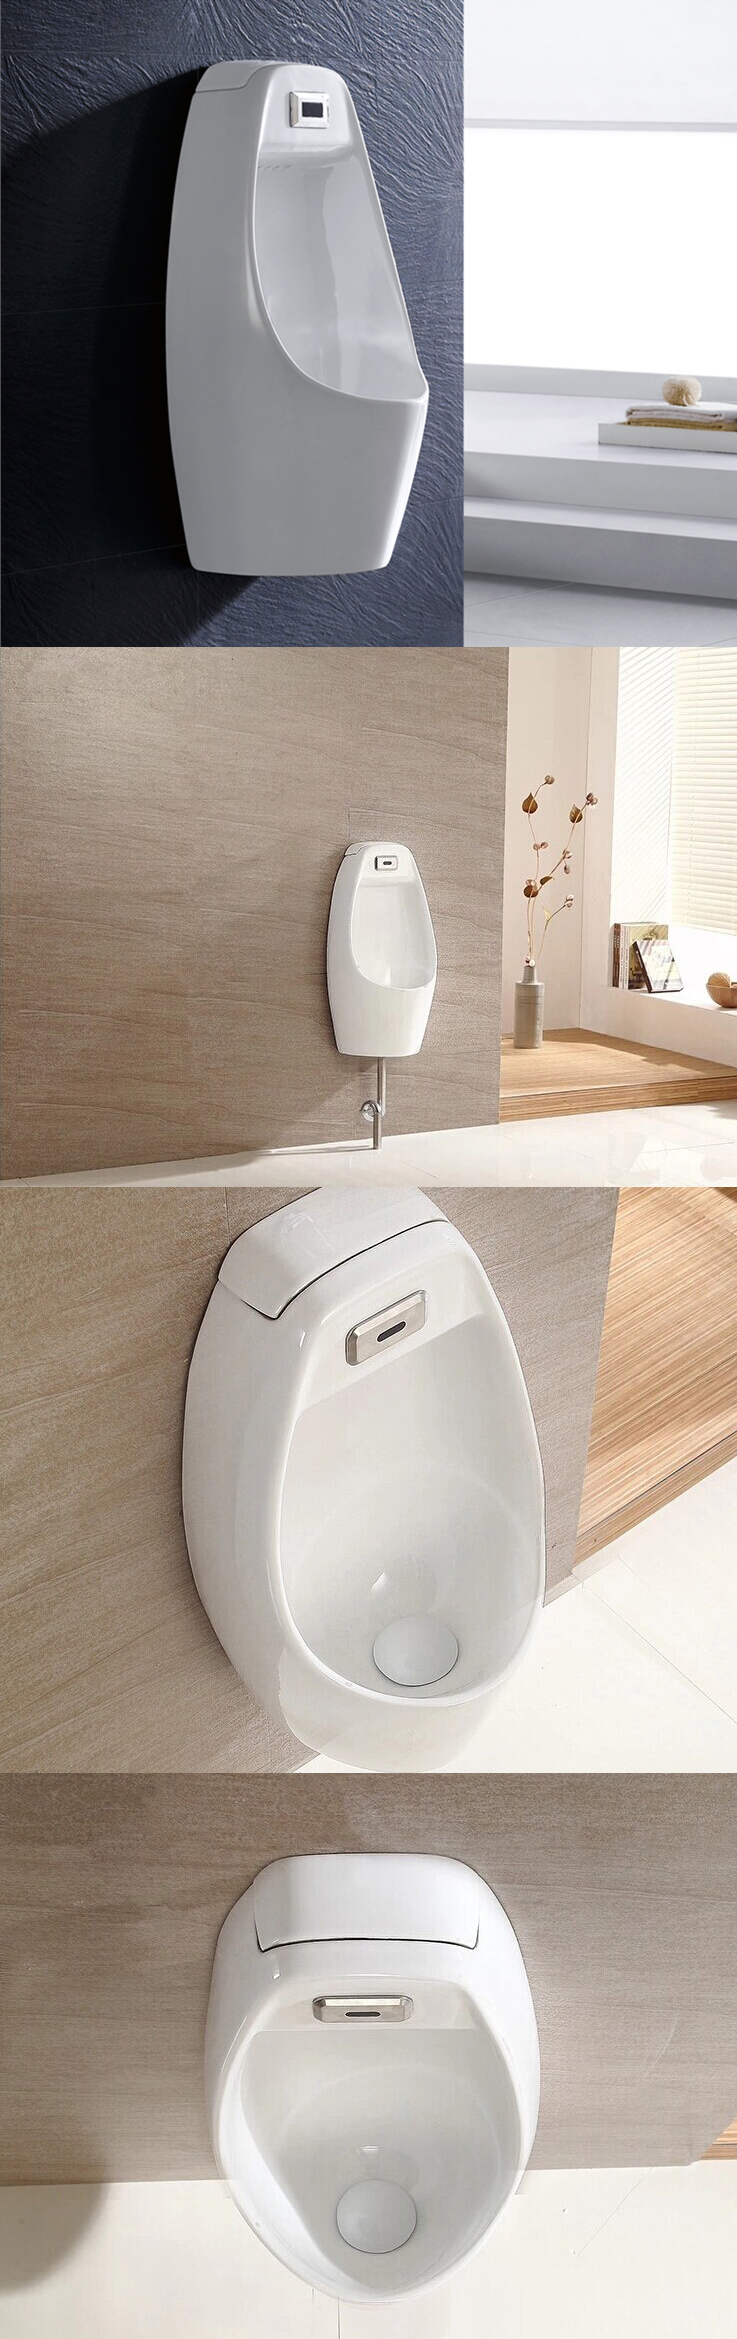 Salle De Bain Urinoir ~ 511 salle de bain sanitaire ware porcelaine murales moderne urinoir